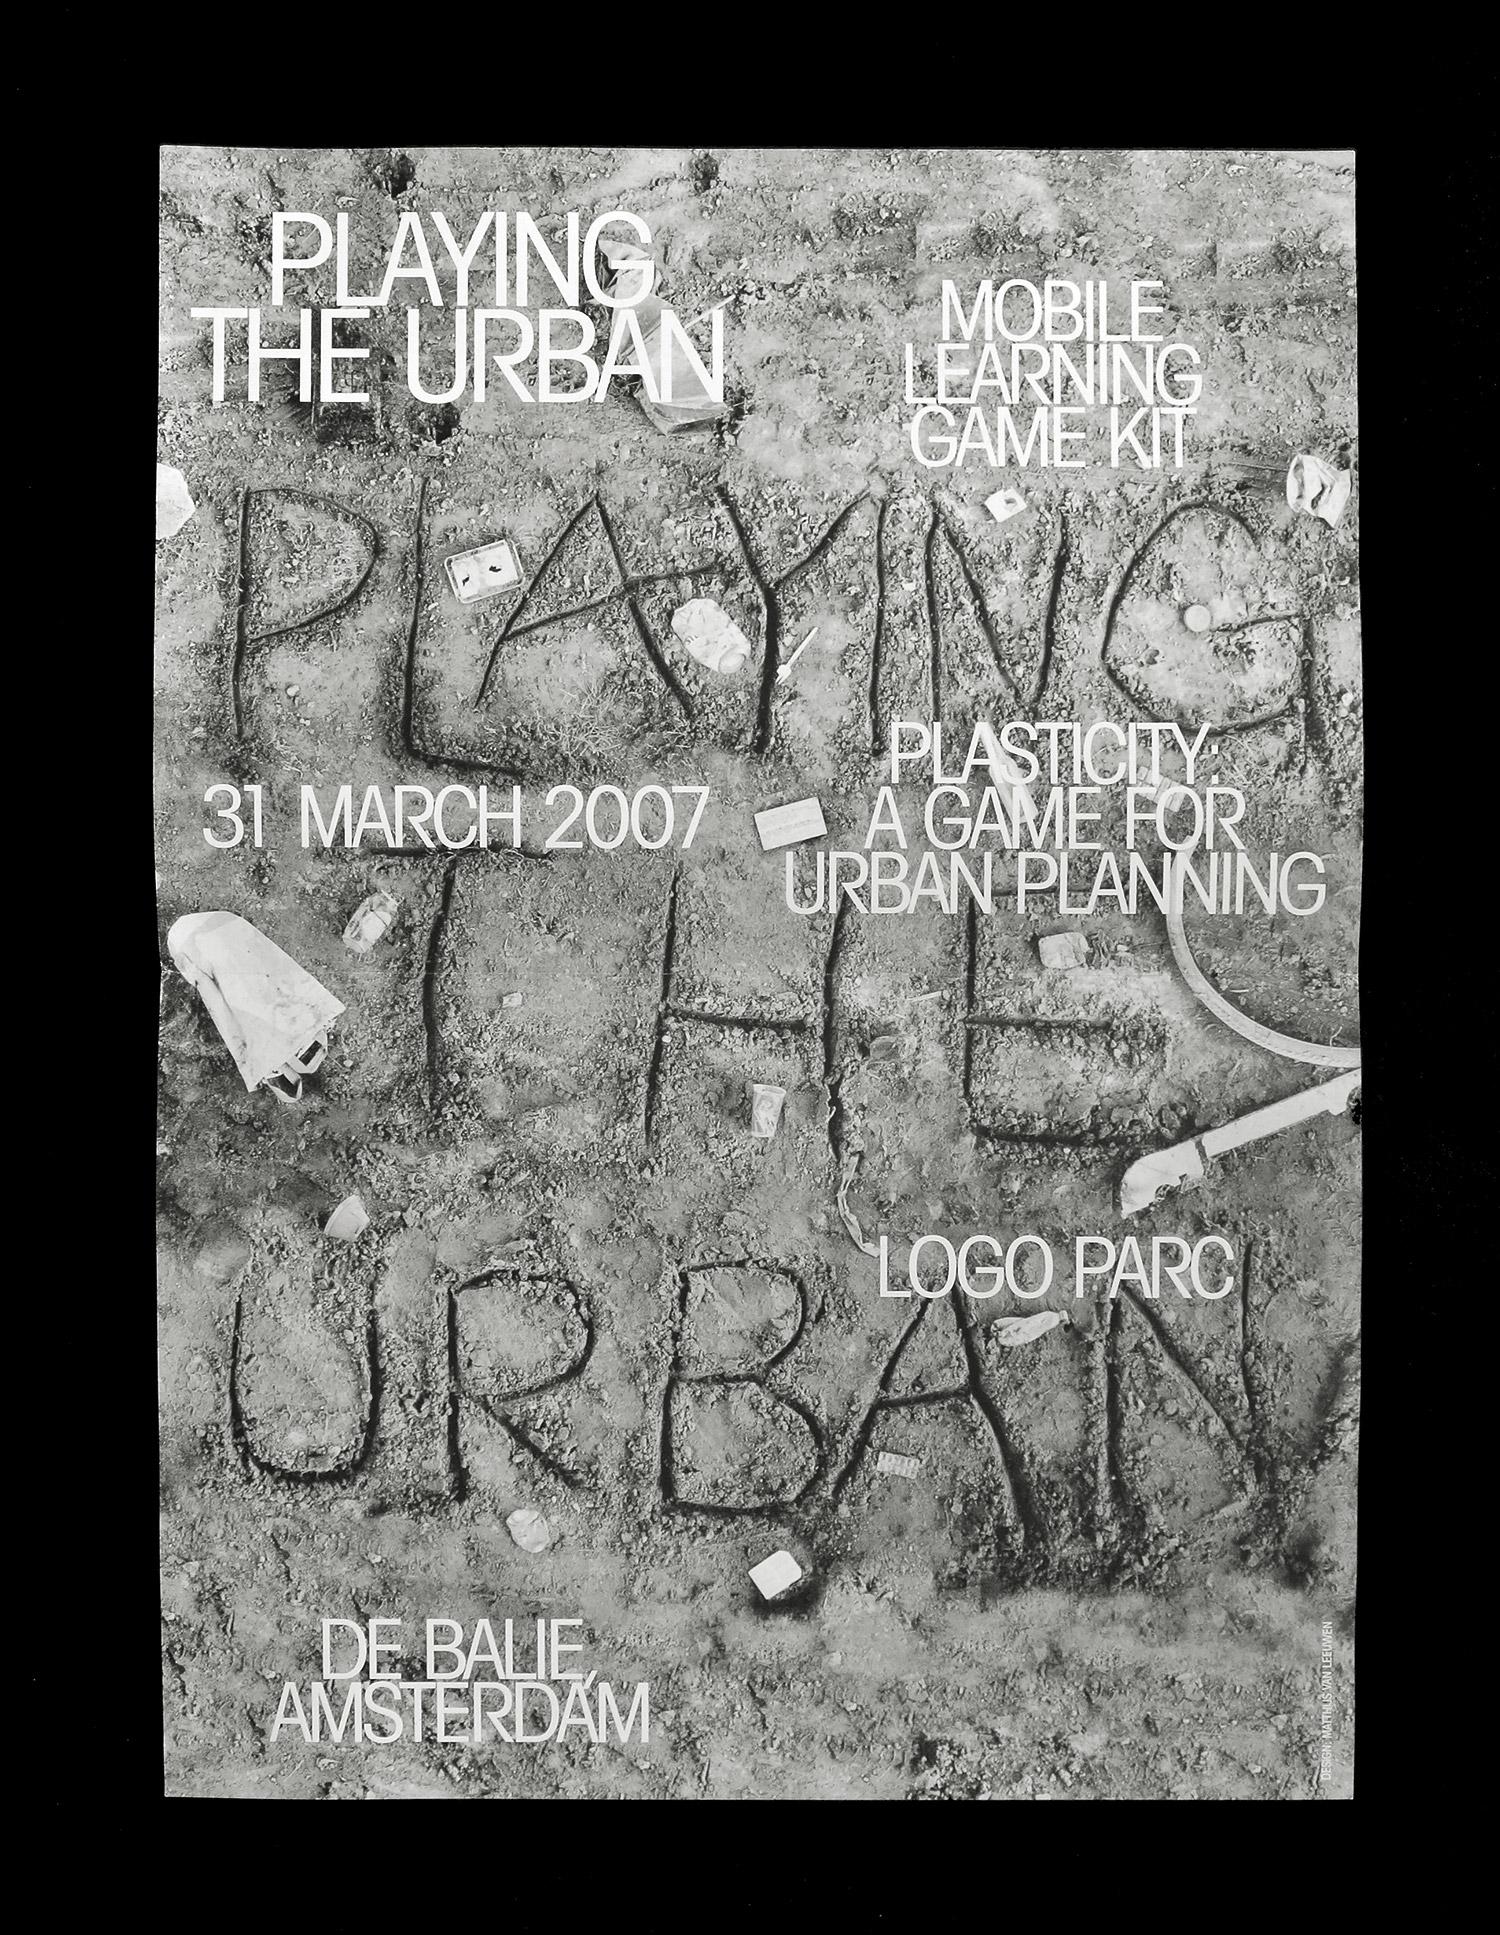 Matthijs Matt van Leeuwen, Playing The Urban, Jan van Eyck, JvE, Logo Parc, De Balie Amsterdam, Posterdesign